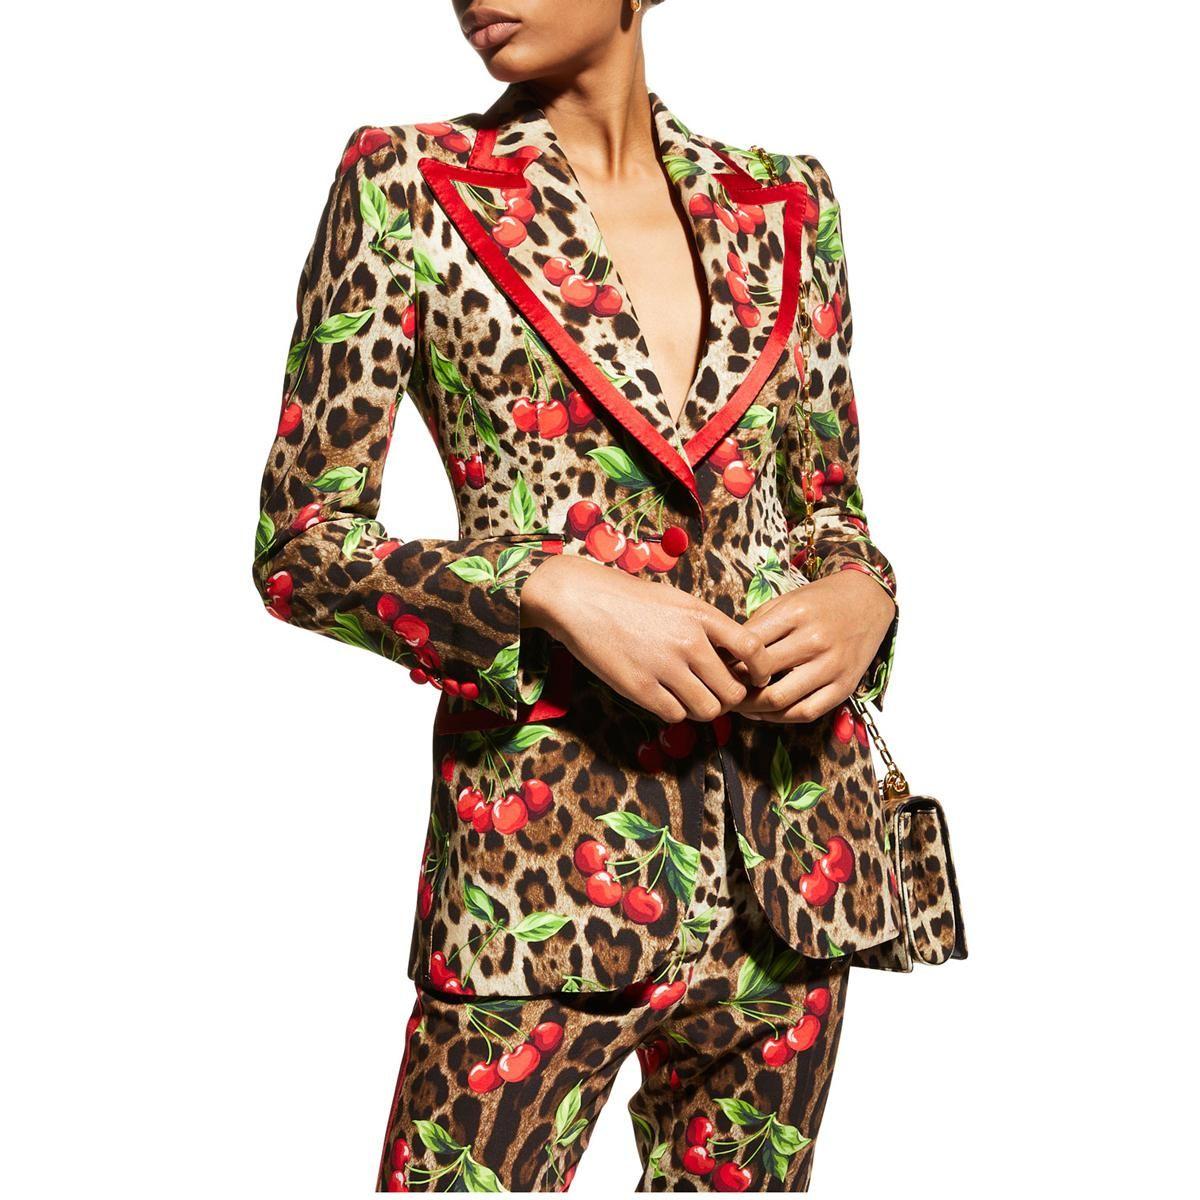 dolce and gabbana turlington leopard and cherry print cady jacket